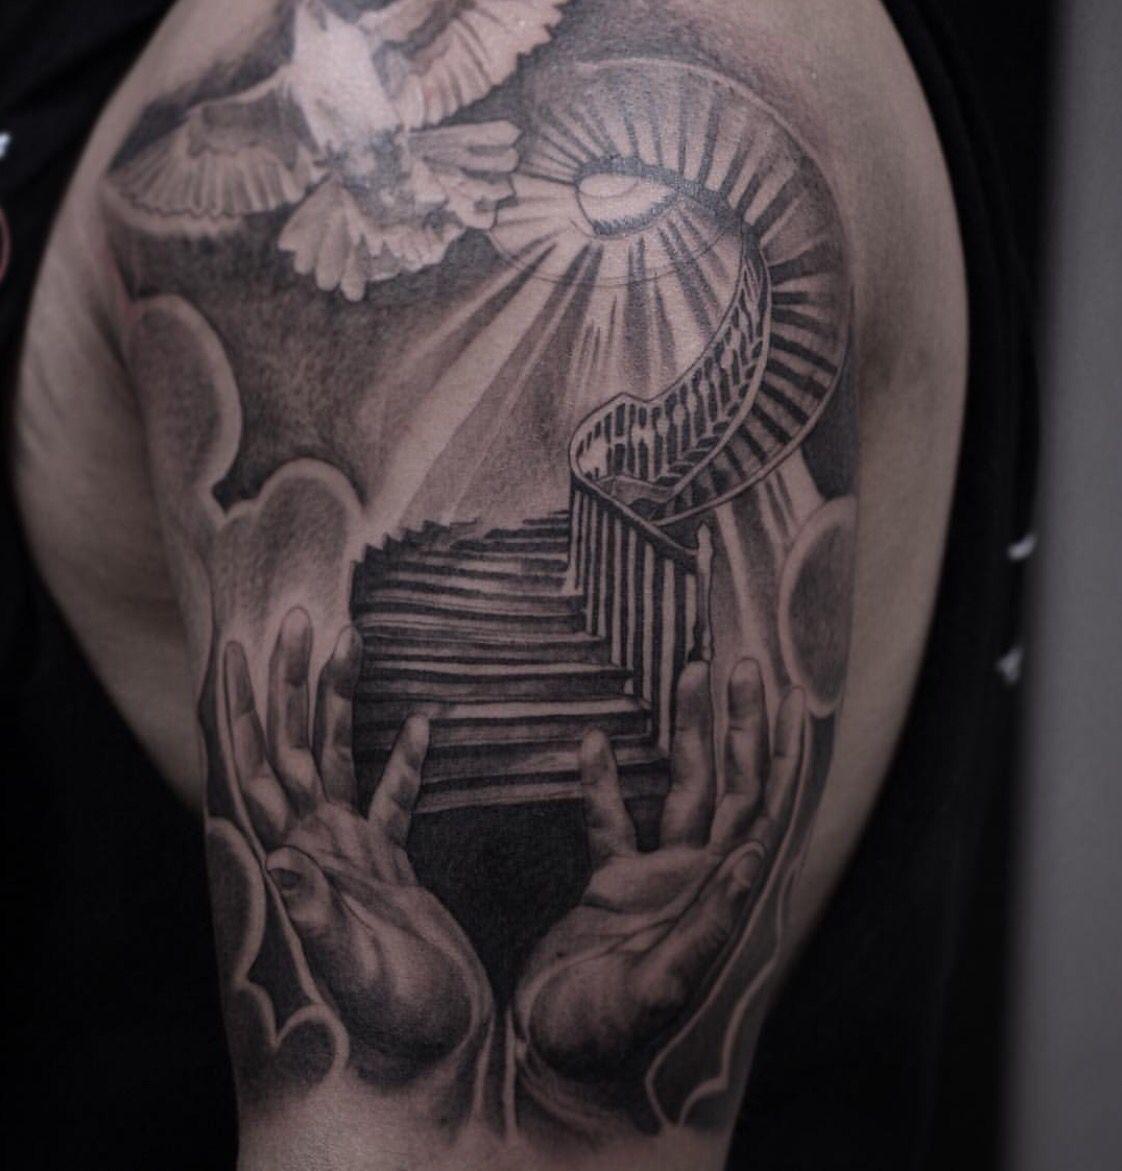 stairway to heaven tattoo gabreal hernandez royal craft. Black Bedroom Furniture Sets. Home Design Ideas